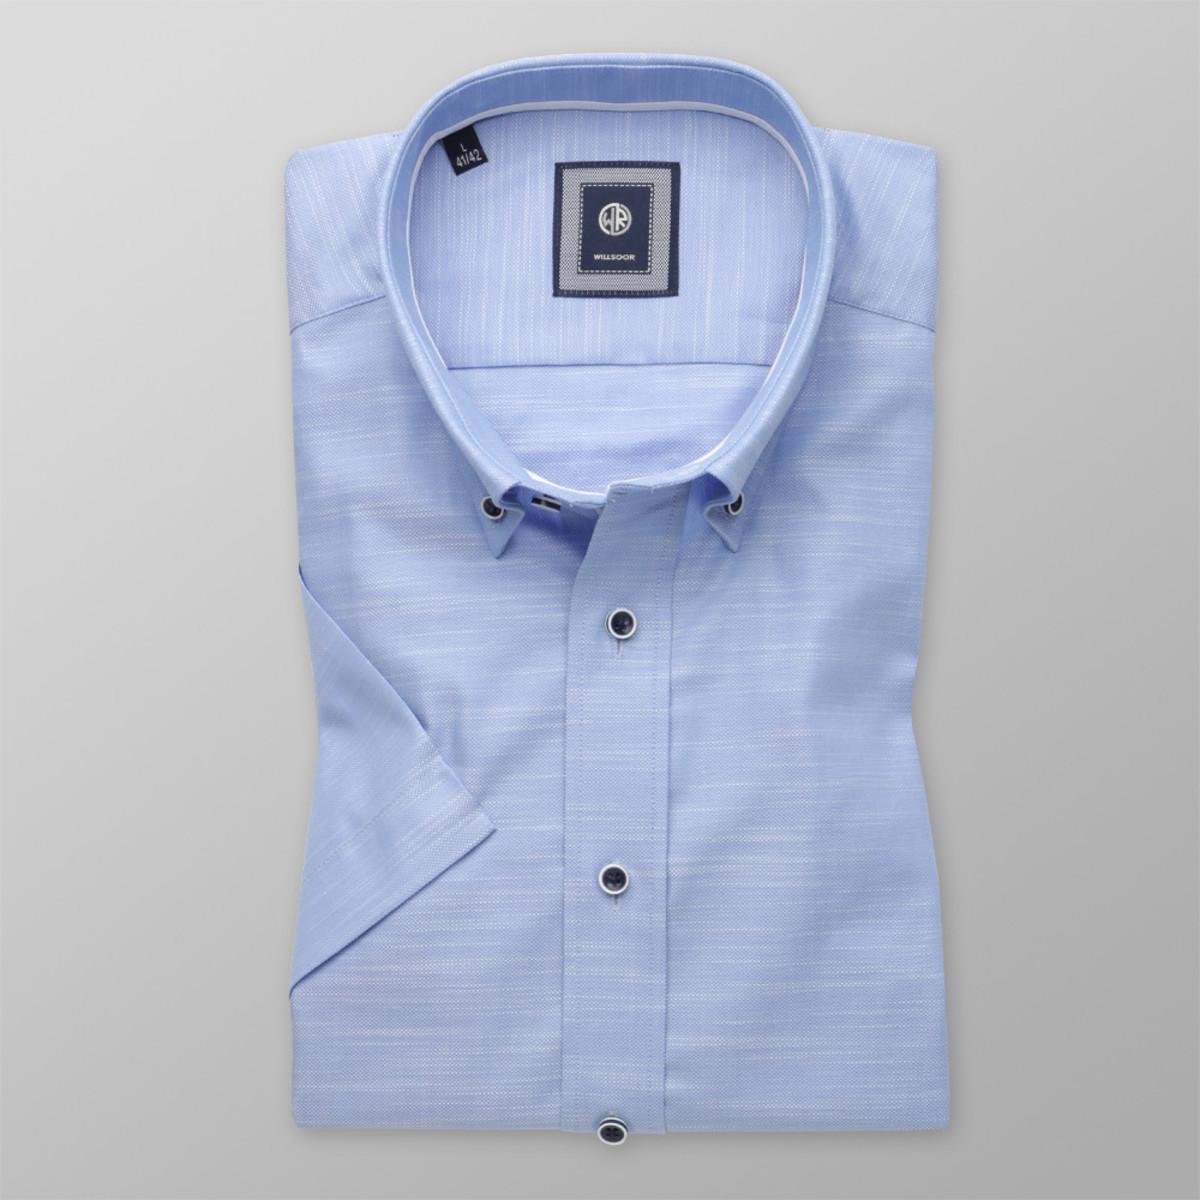 Košeľa Slim Fit bledo modrá (výška 176- 182) 10488 176-182 / L (41/42)